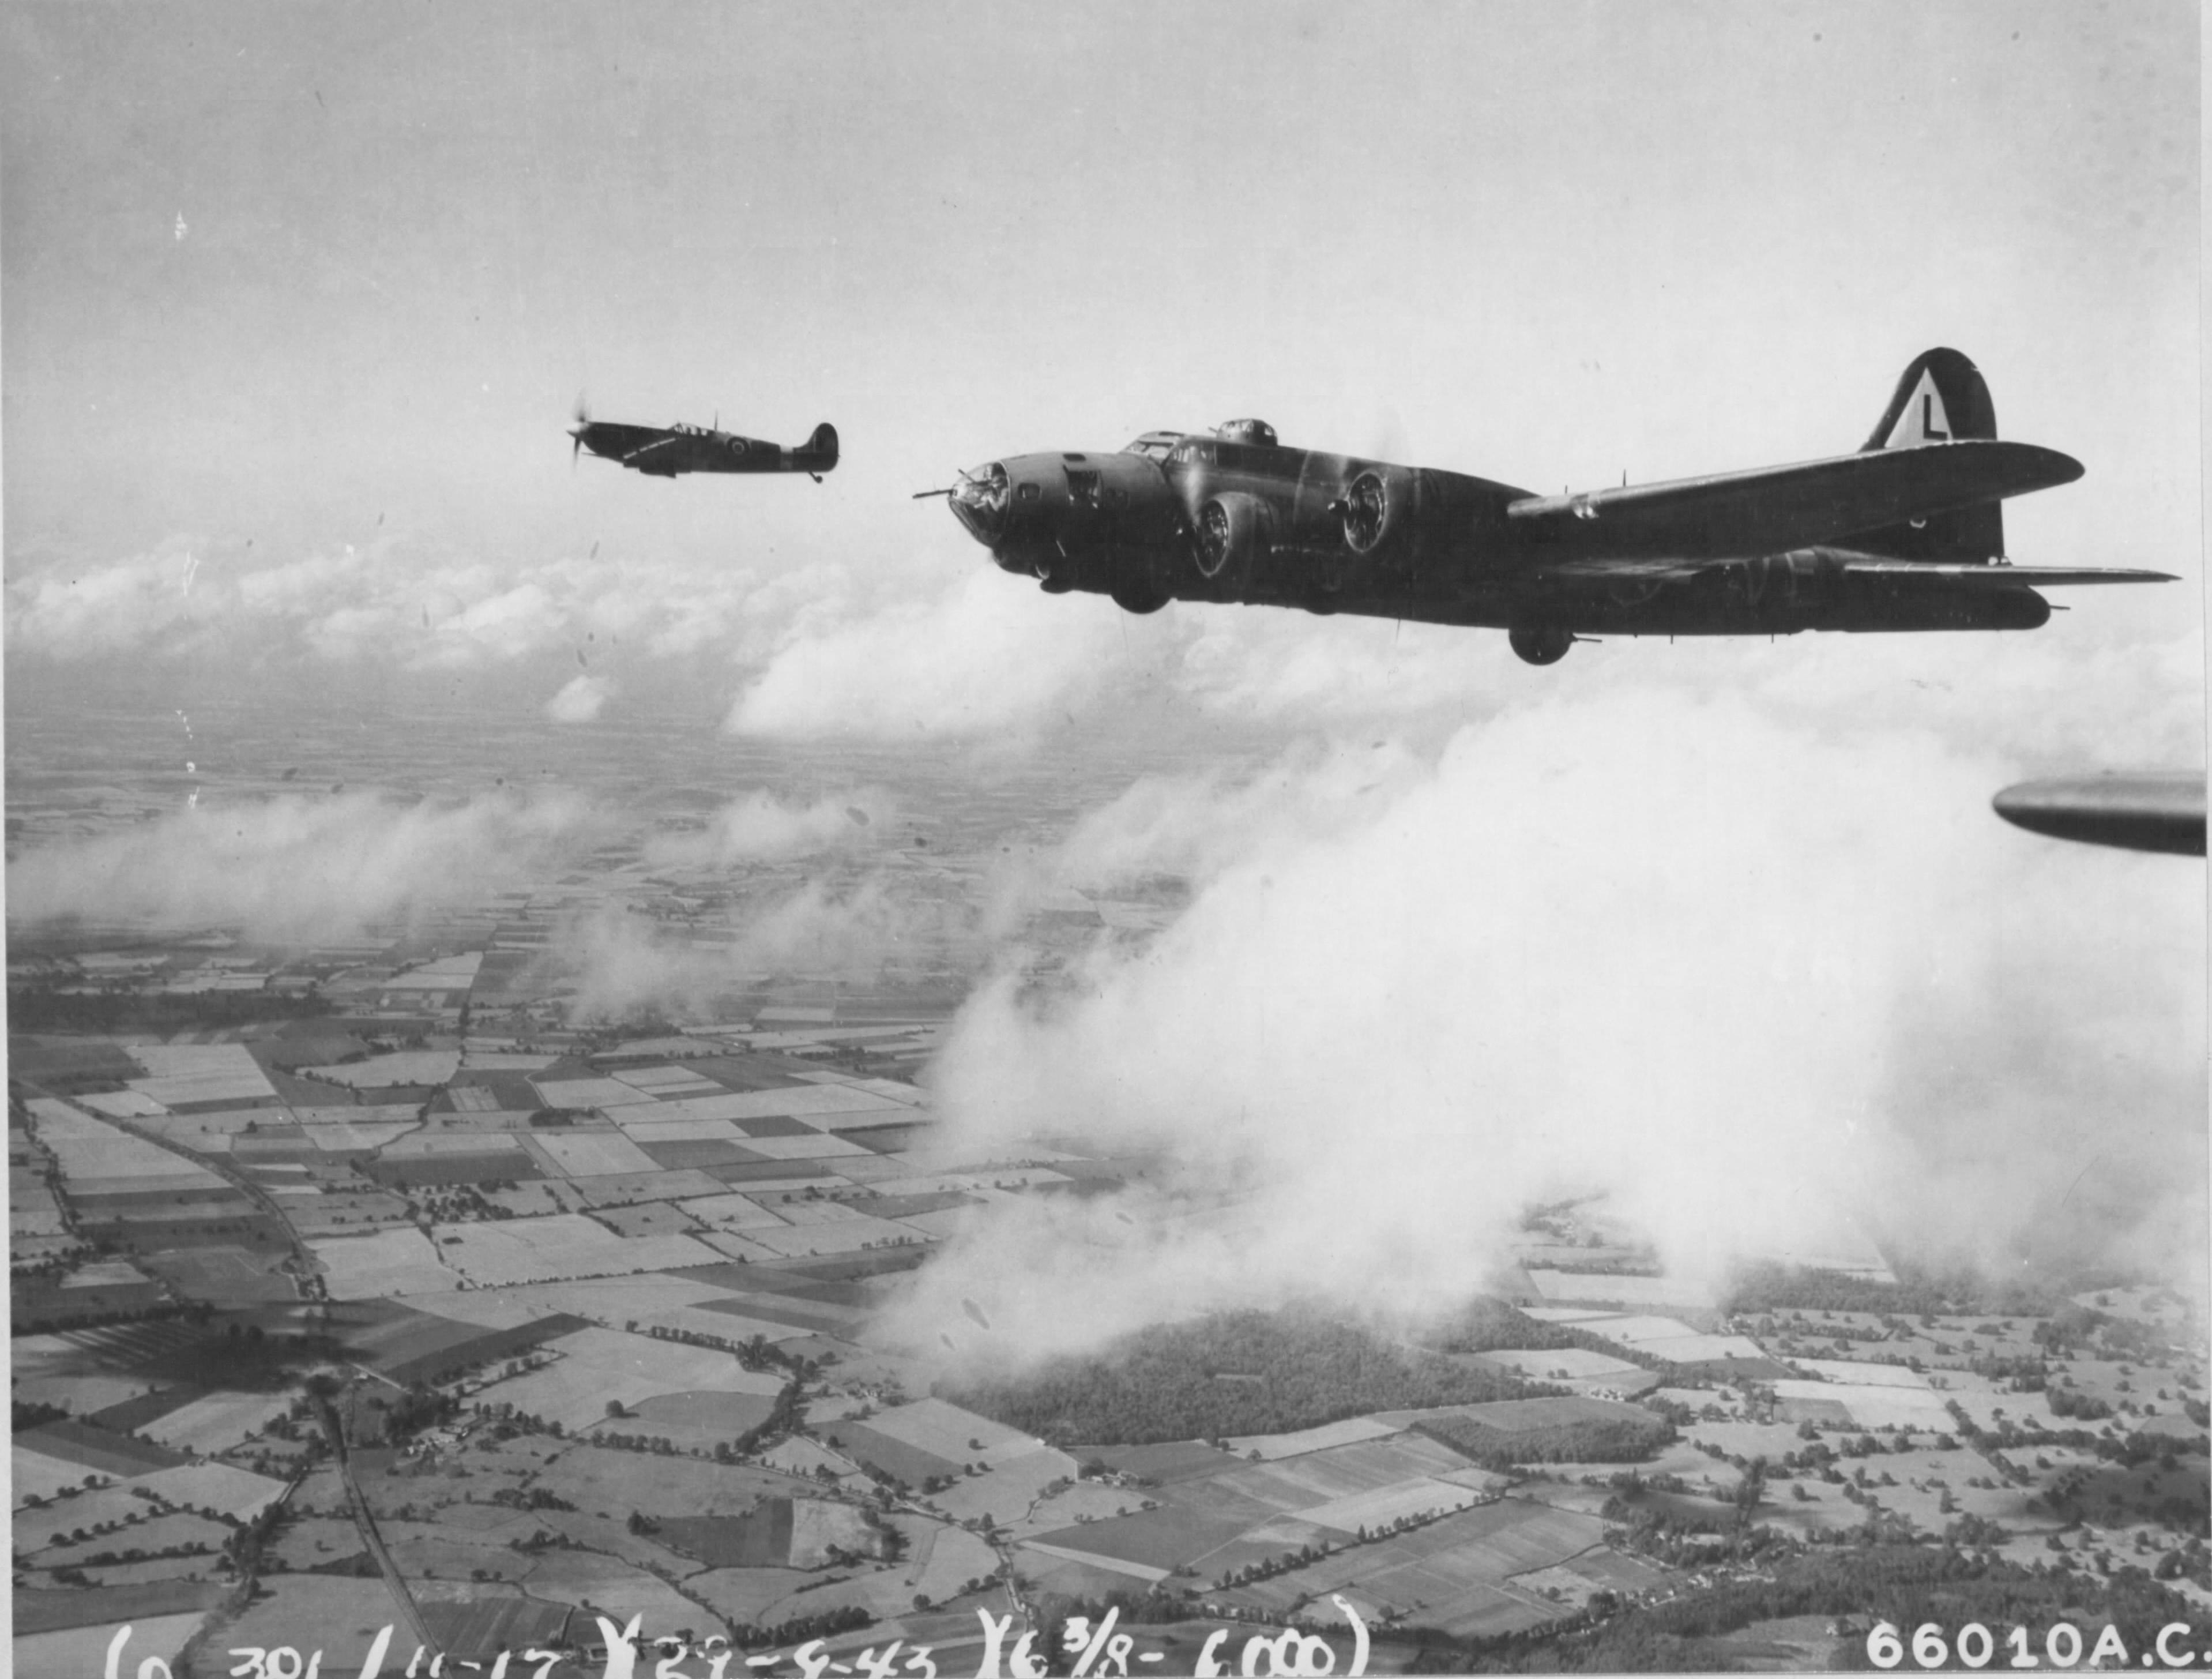 Spitfire MkIX RAF 302Sqn WXR MH869 escorts 8AF B 17 Fortress over France early 1944 01